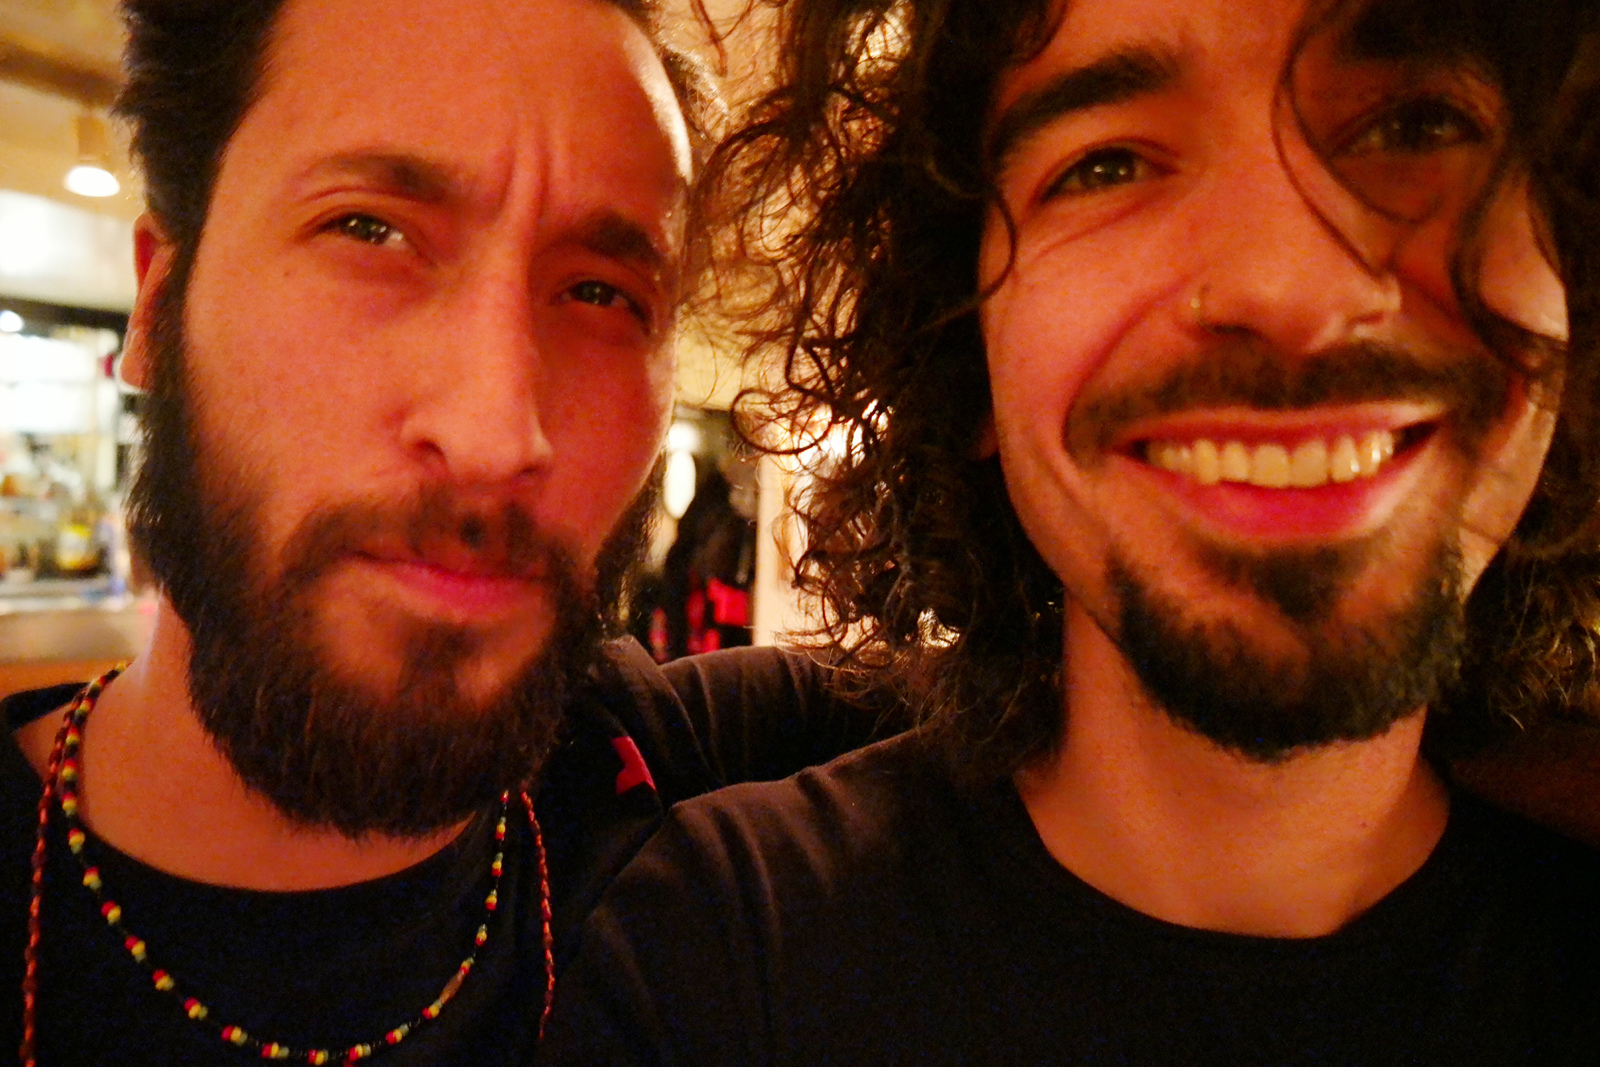 Selfie original exclu UsofParis d'Octavio et Raphaël